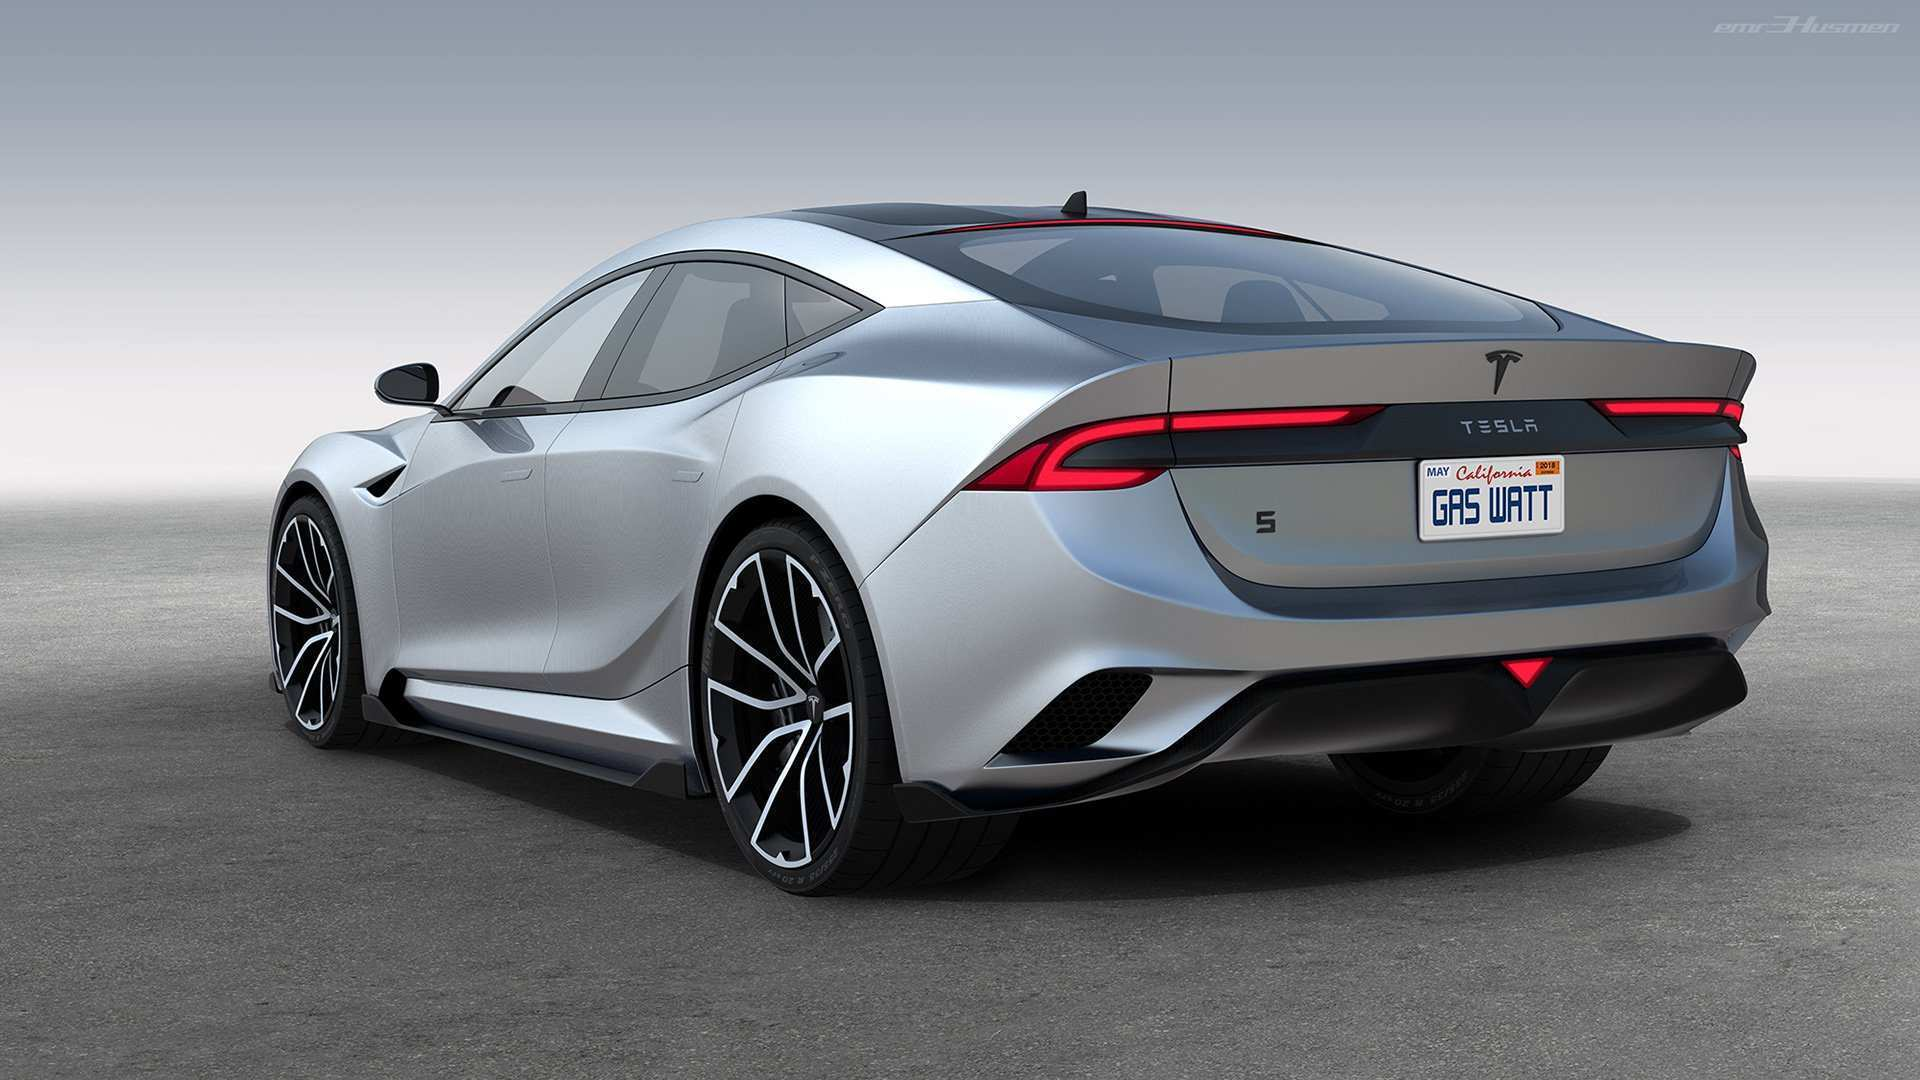 78 Concept of Tesla S 2020 Spy Shoot for Tesla S 2020